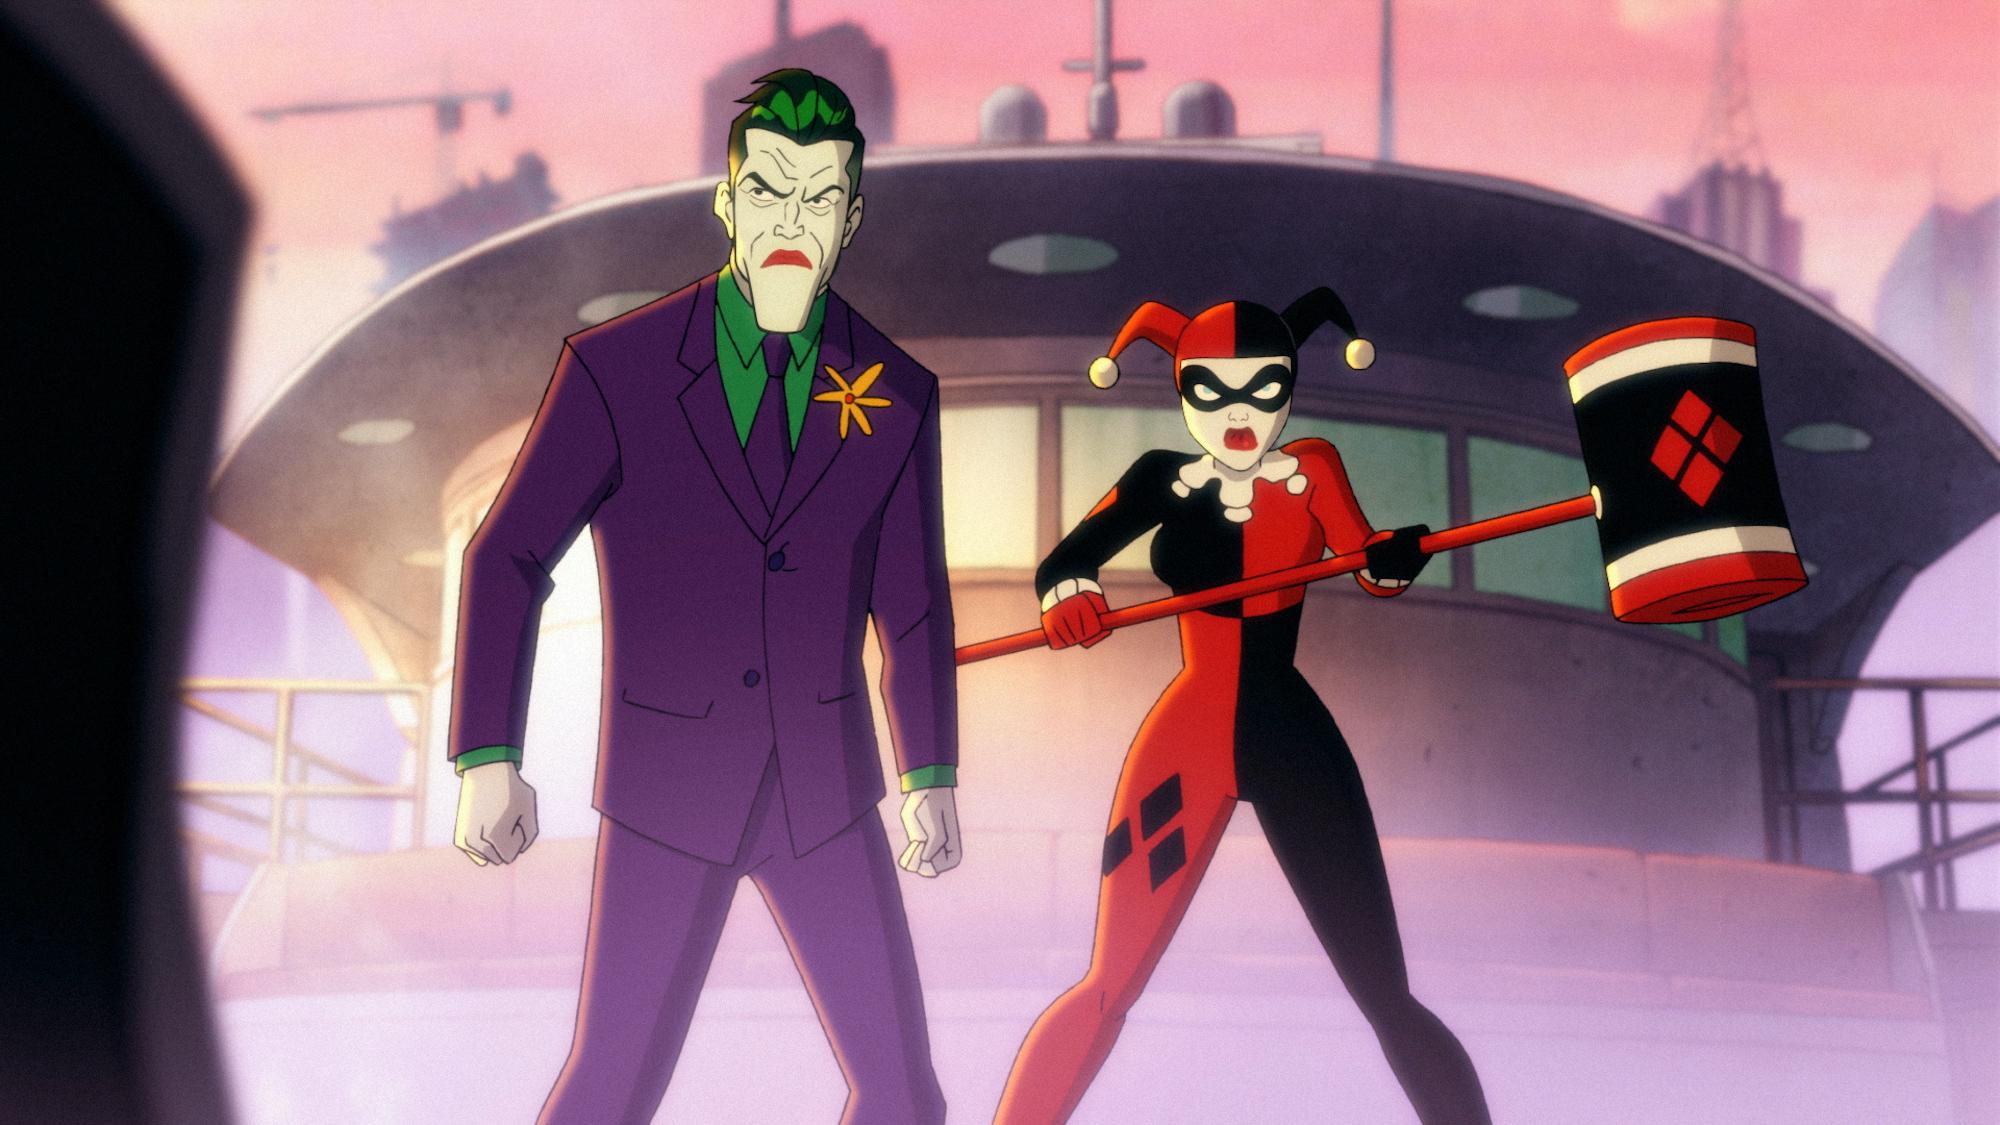 Harley Quinn and the Joker as a team in 'Harley Quinn'